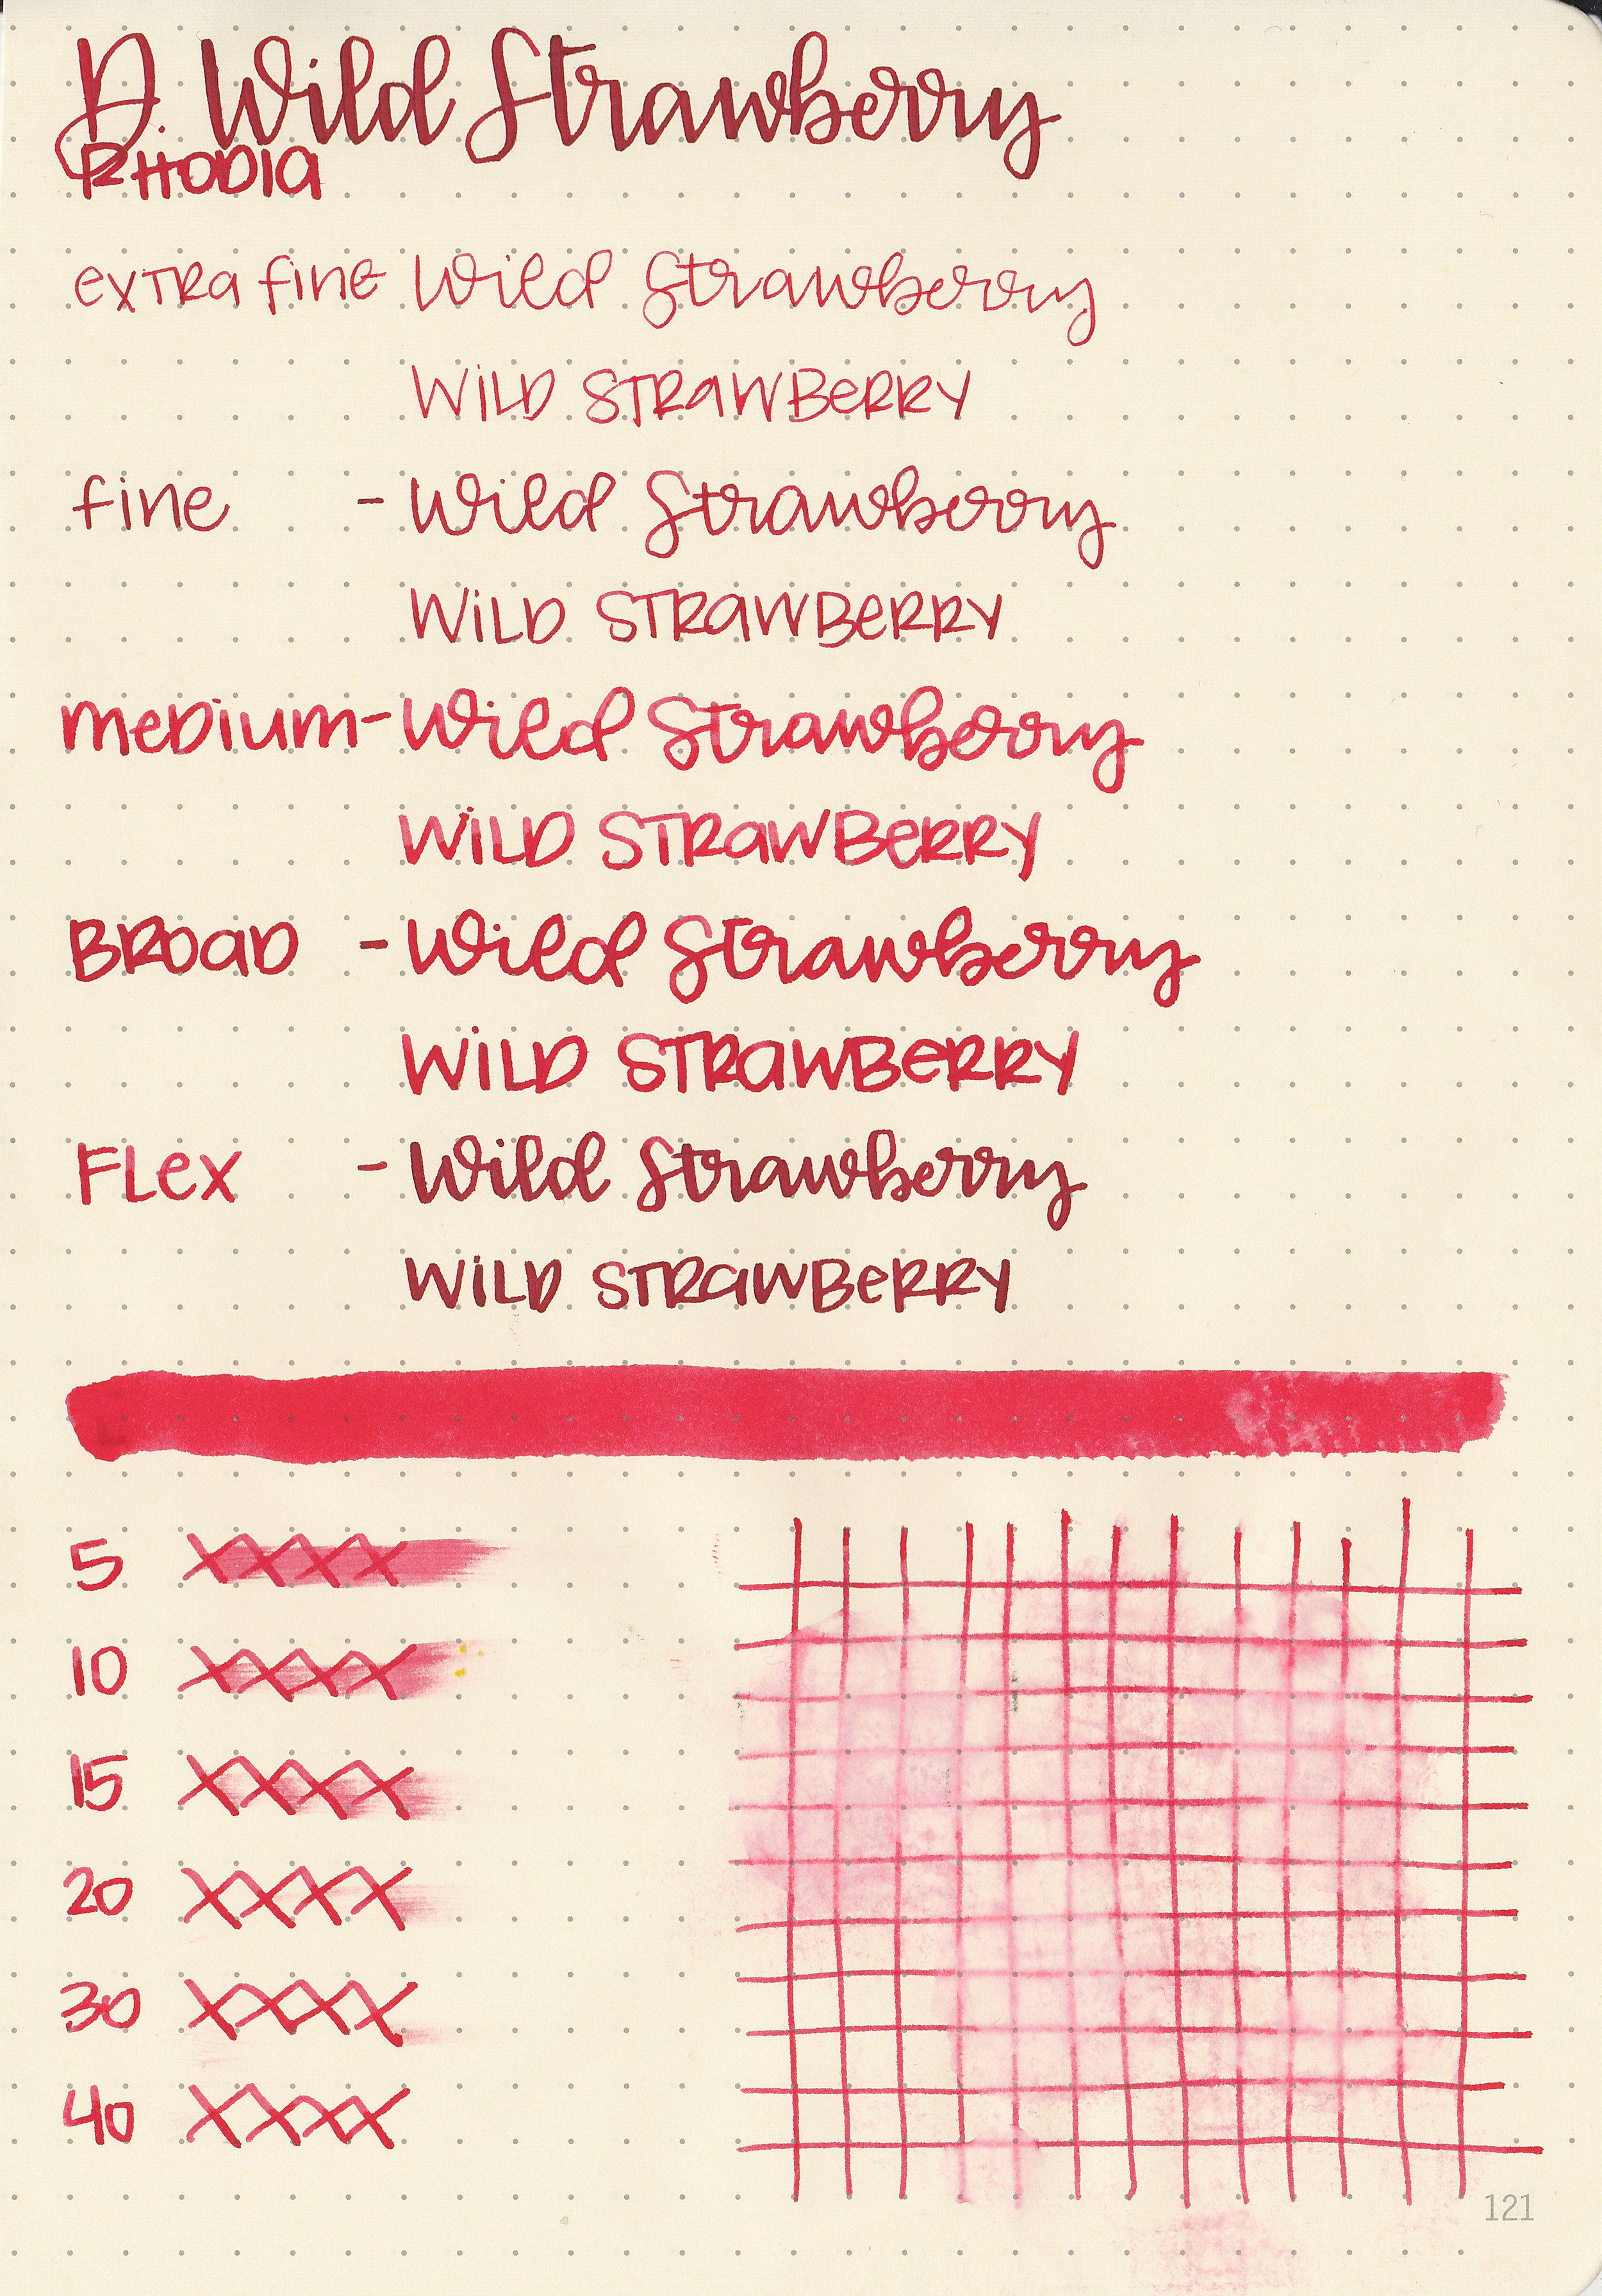 d-wild-strawberry-5.jpg